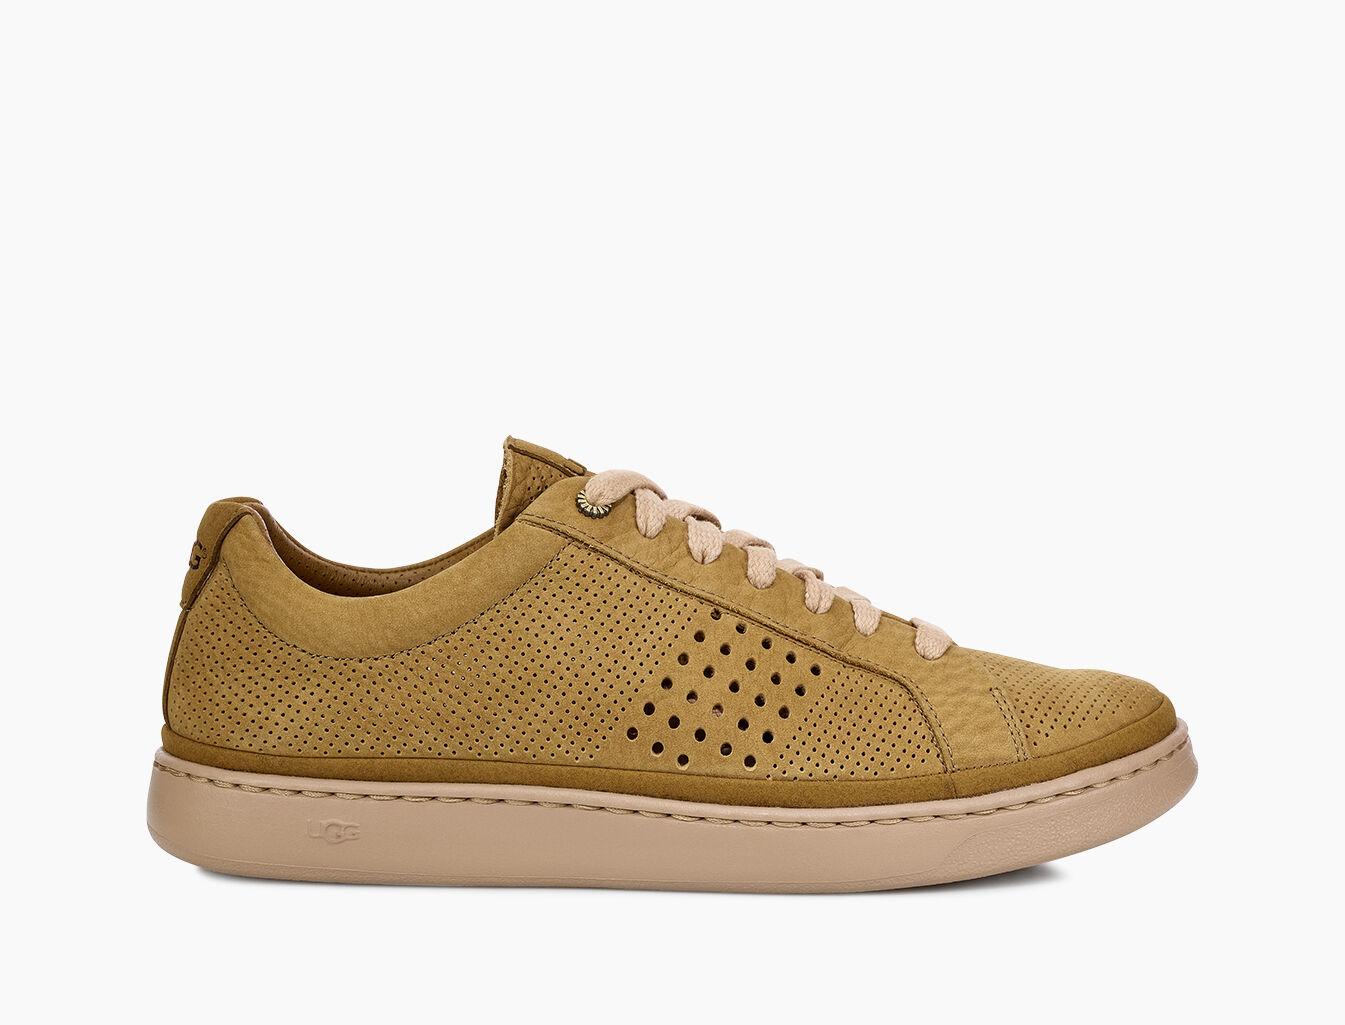 Zoom Cali Sneaker Low Perf - Image 1 of 6